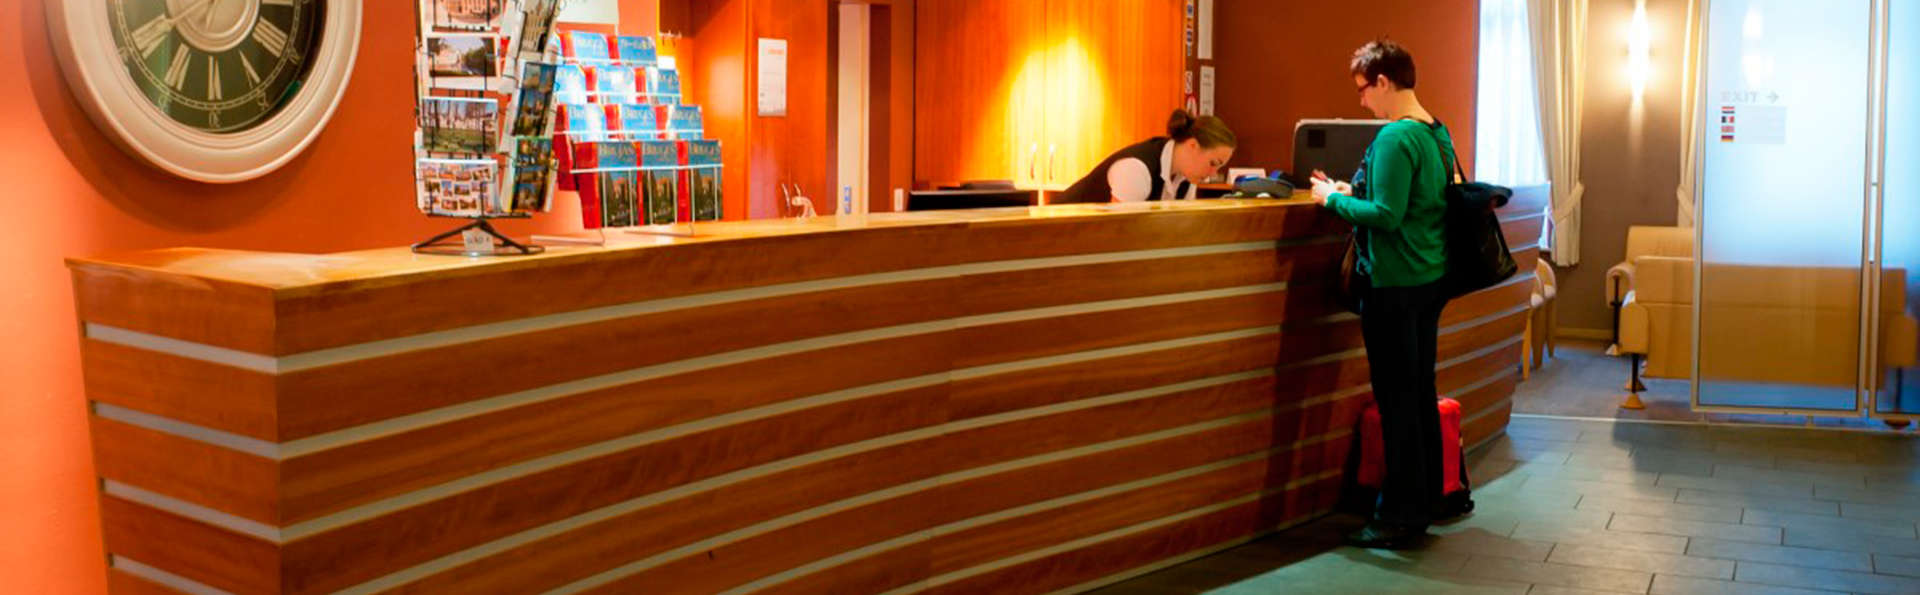 Hotel Academie - EDIT_reception.jpg